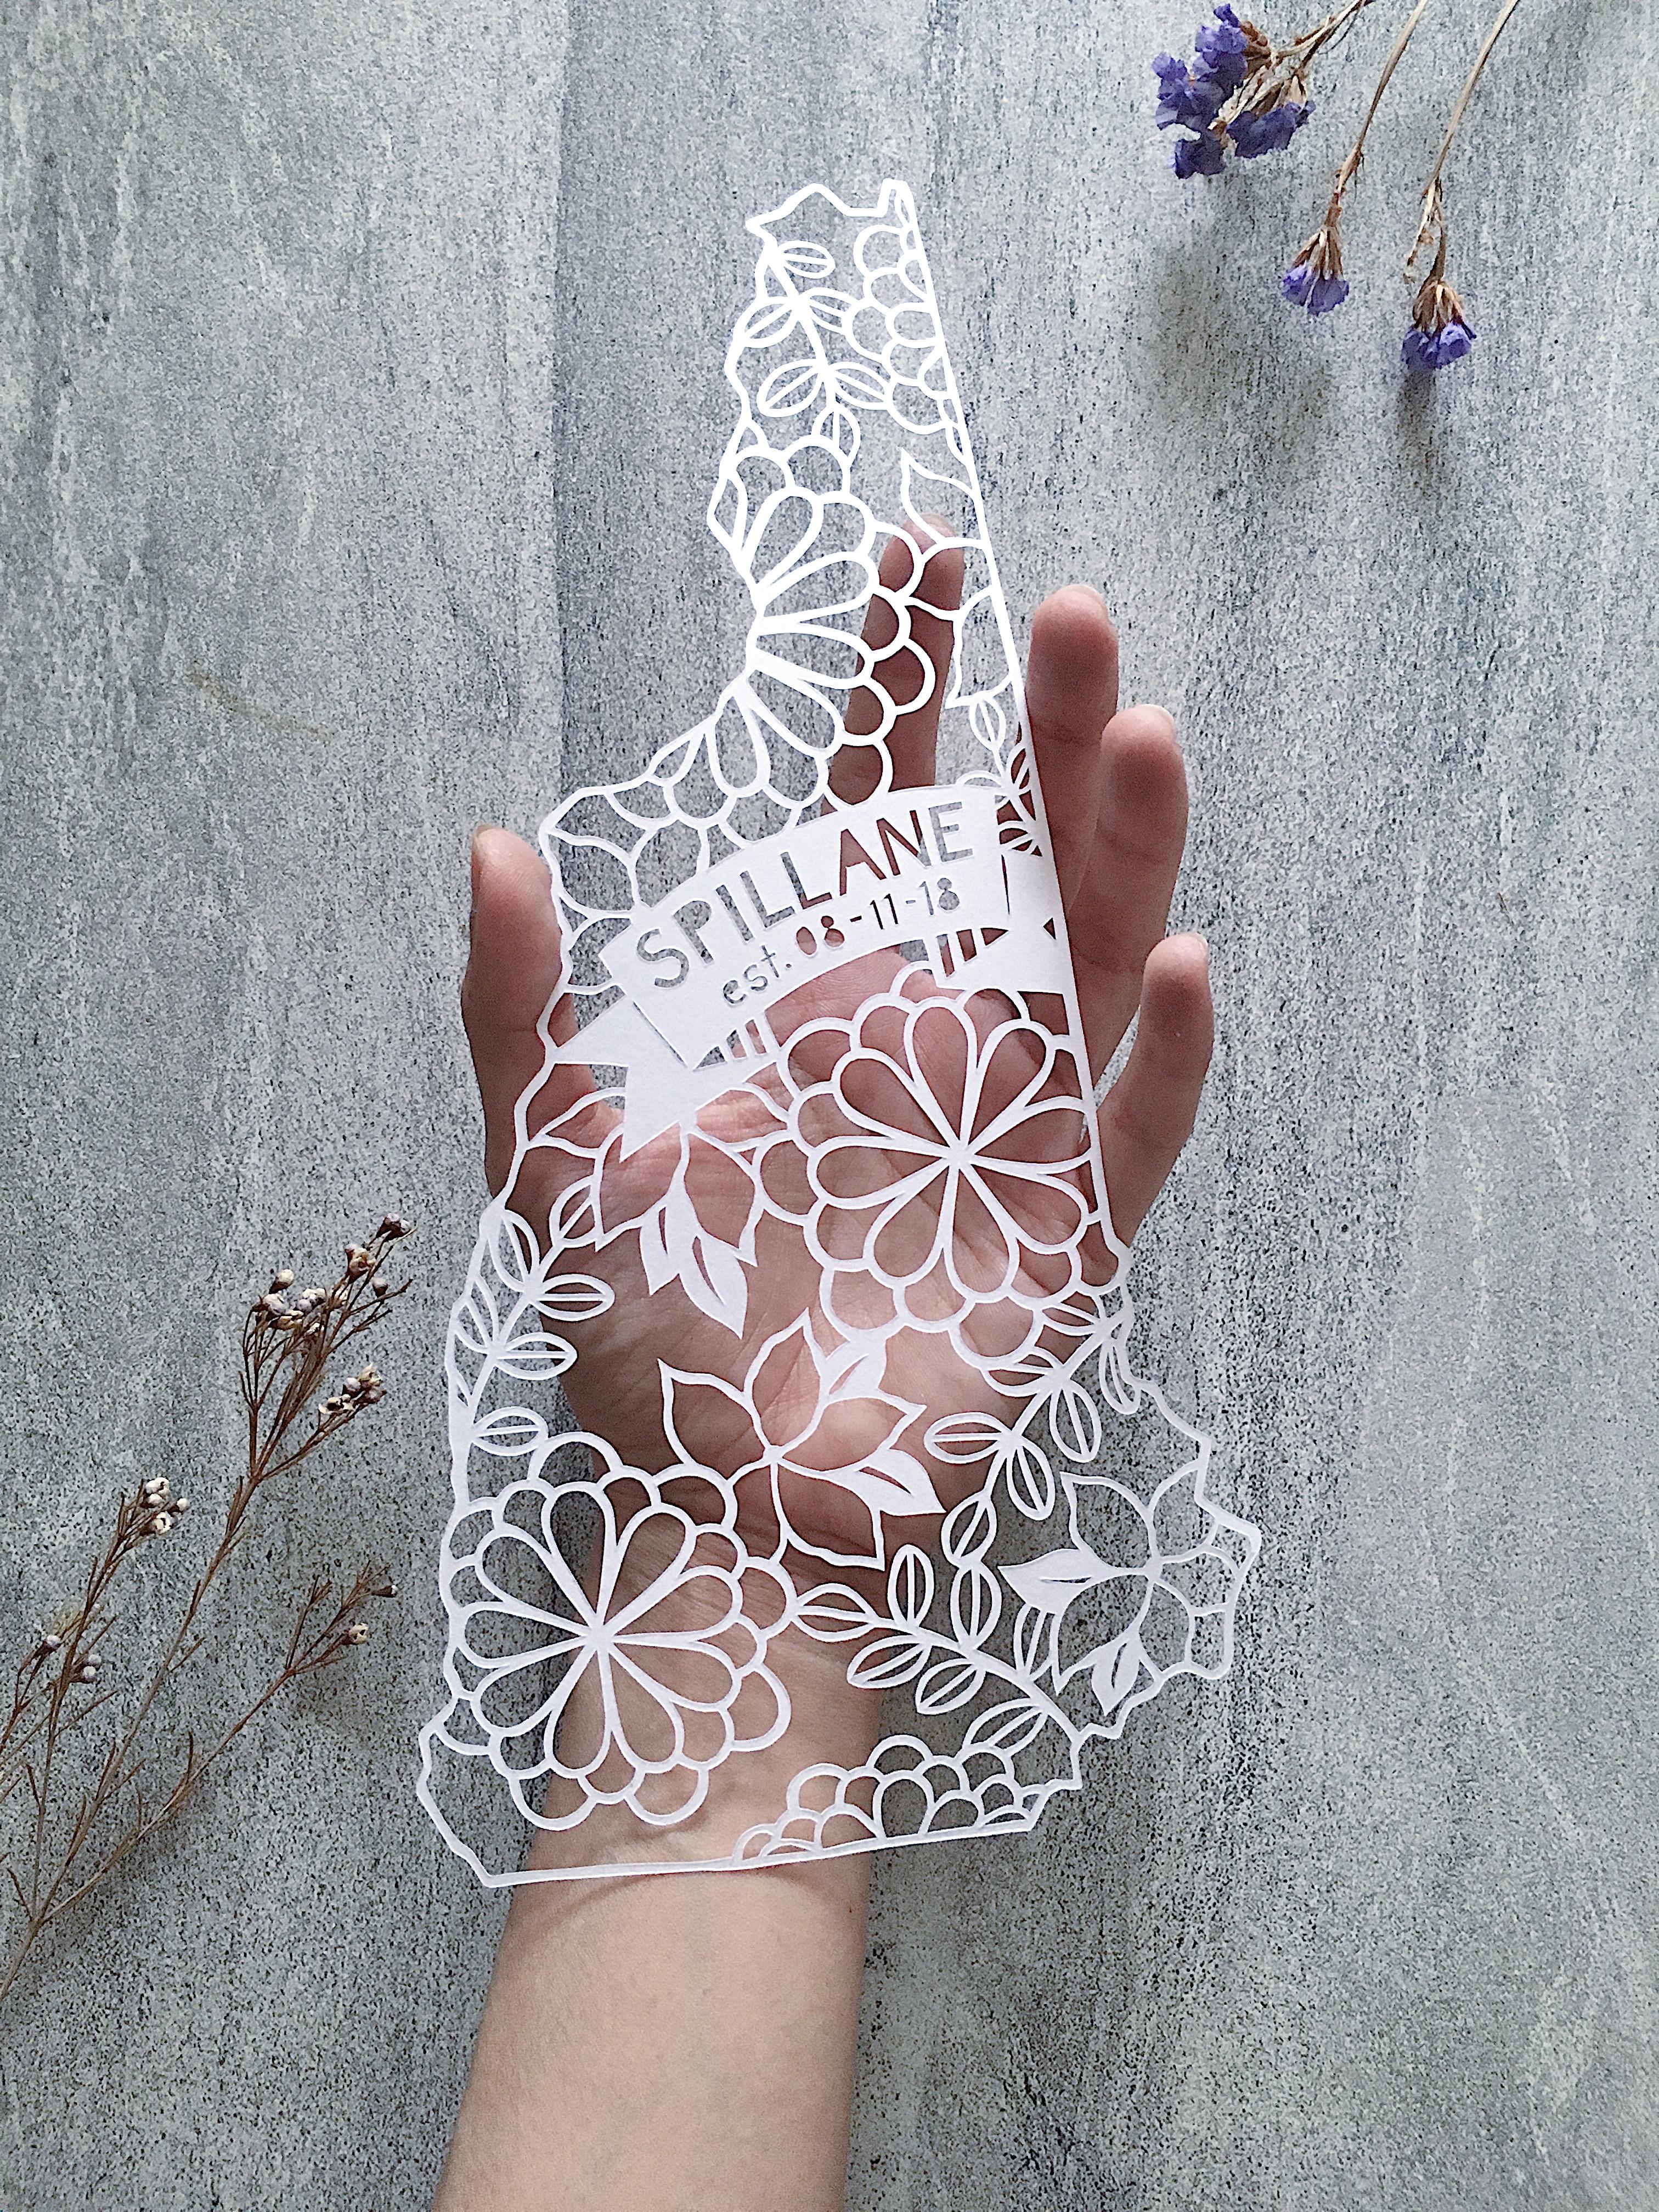 papercut-art-personalized-wedding-gift-new-hampshire-map-scherenschnitte (1)